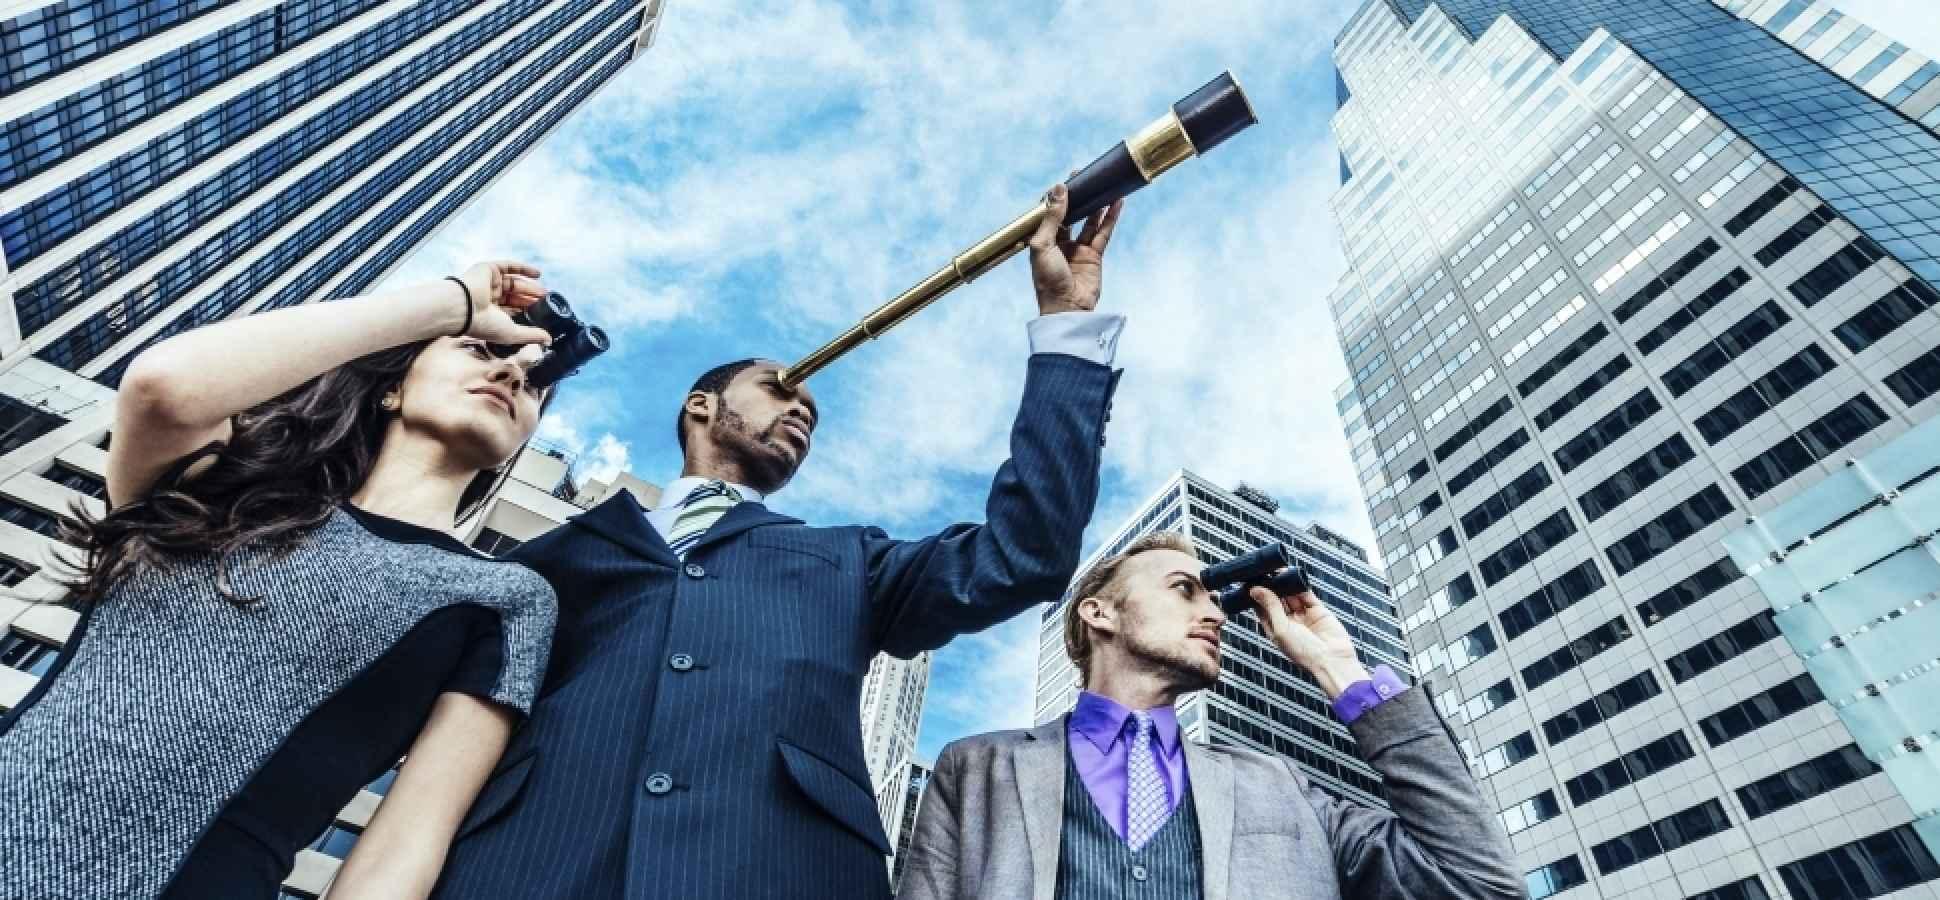 10 Steps for Success as an Entrepreneur